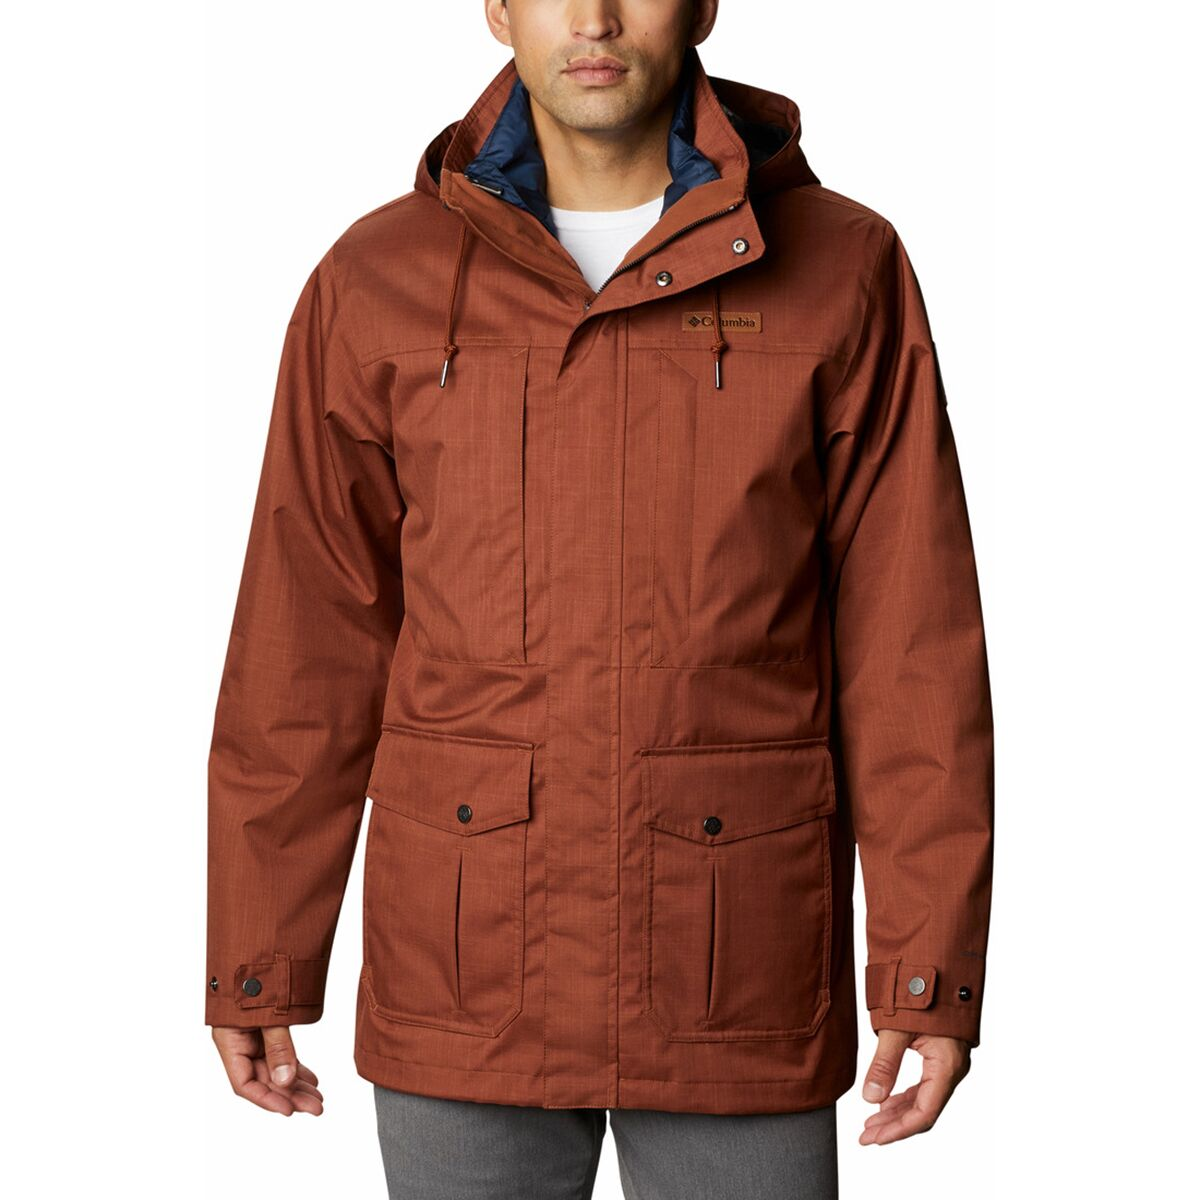 Horizons Pine Interchange Jacket - Men